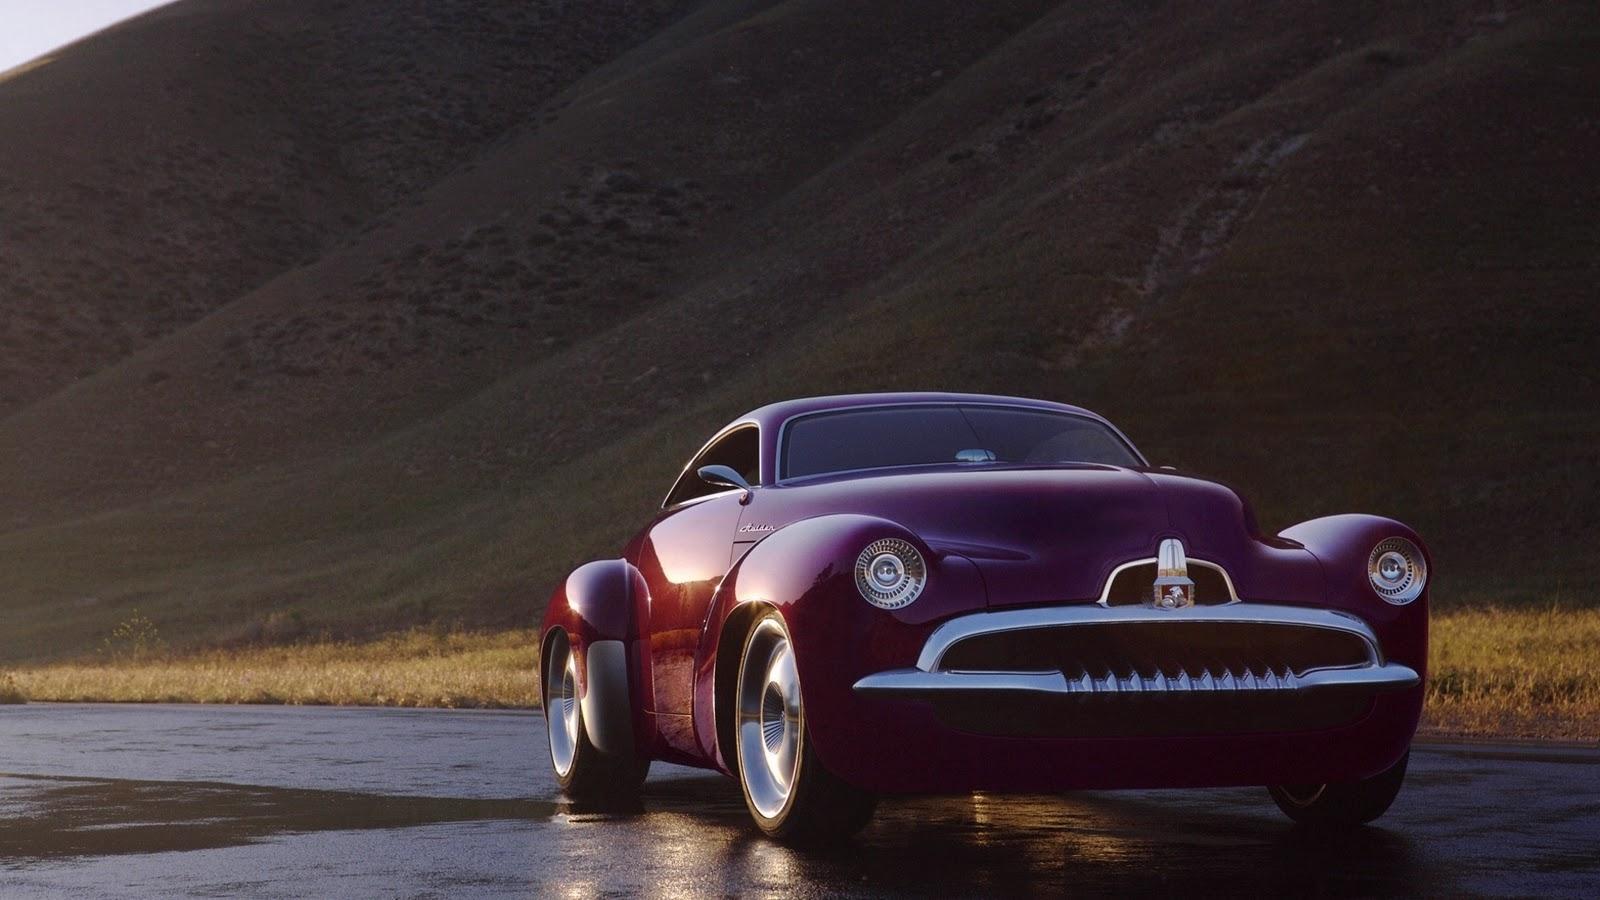 High Definition Wallpapers: HD classic car wallpaper